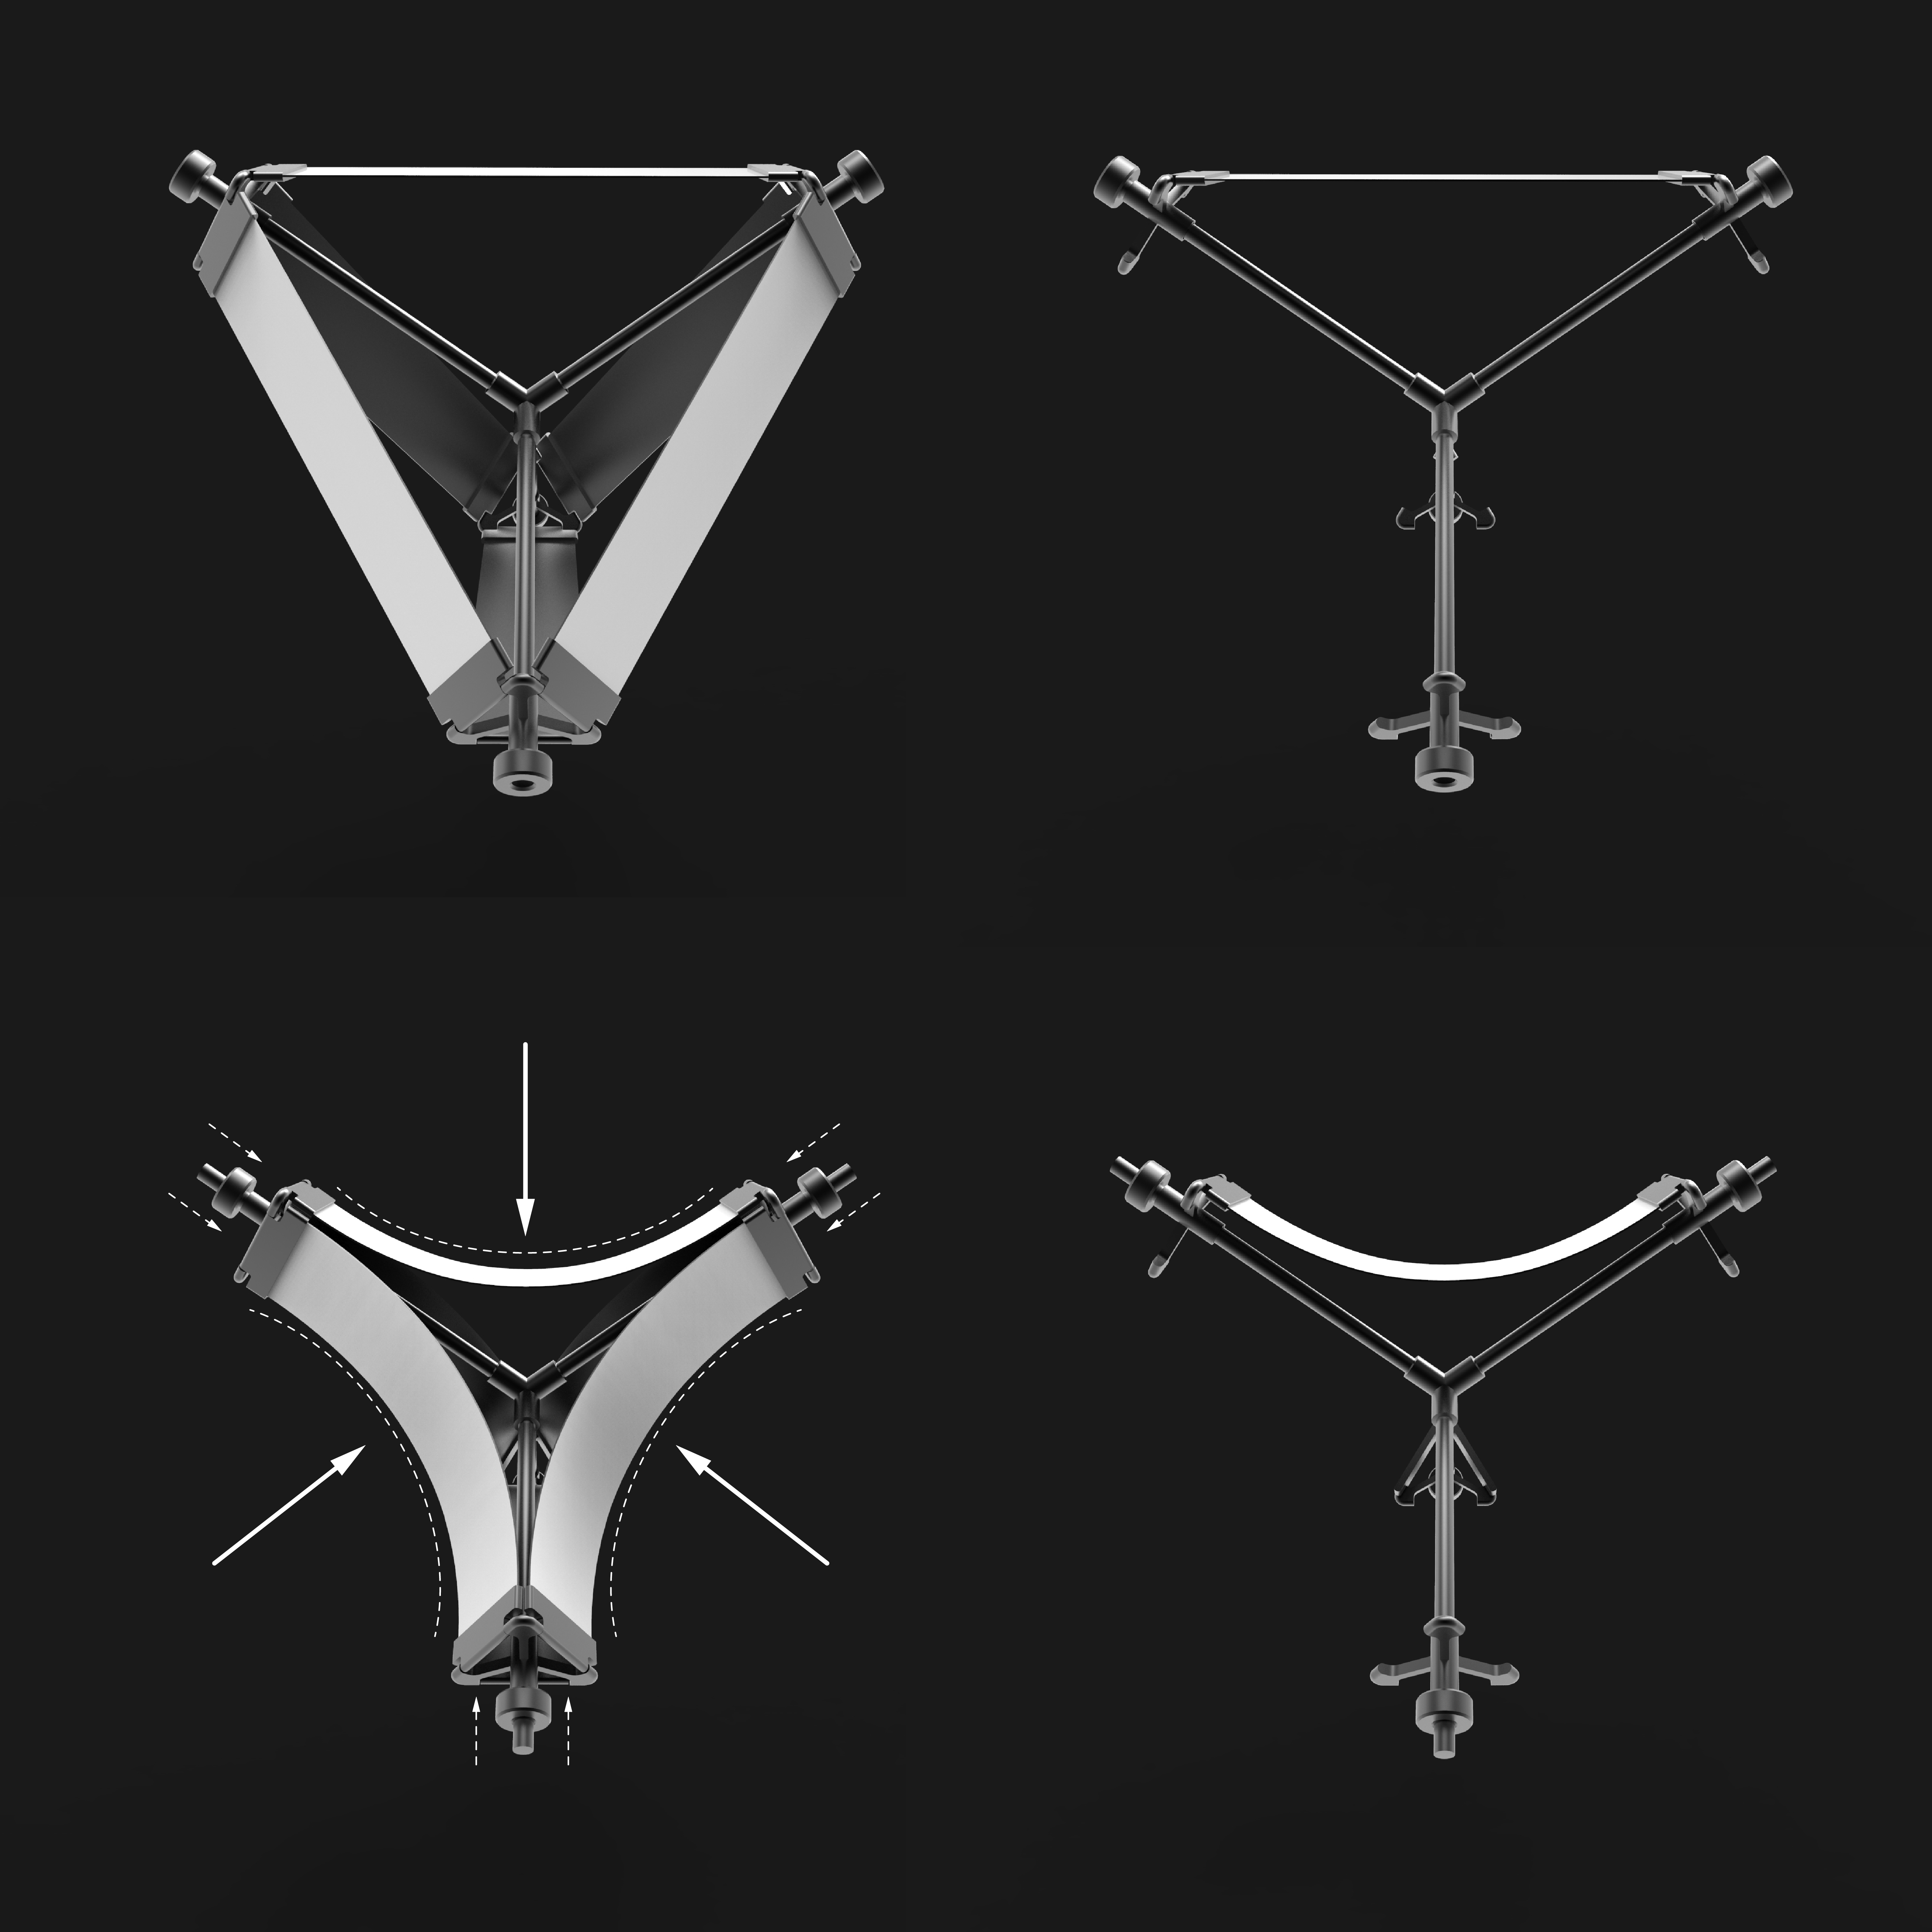 LG Geometry_Behance-03